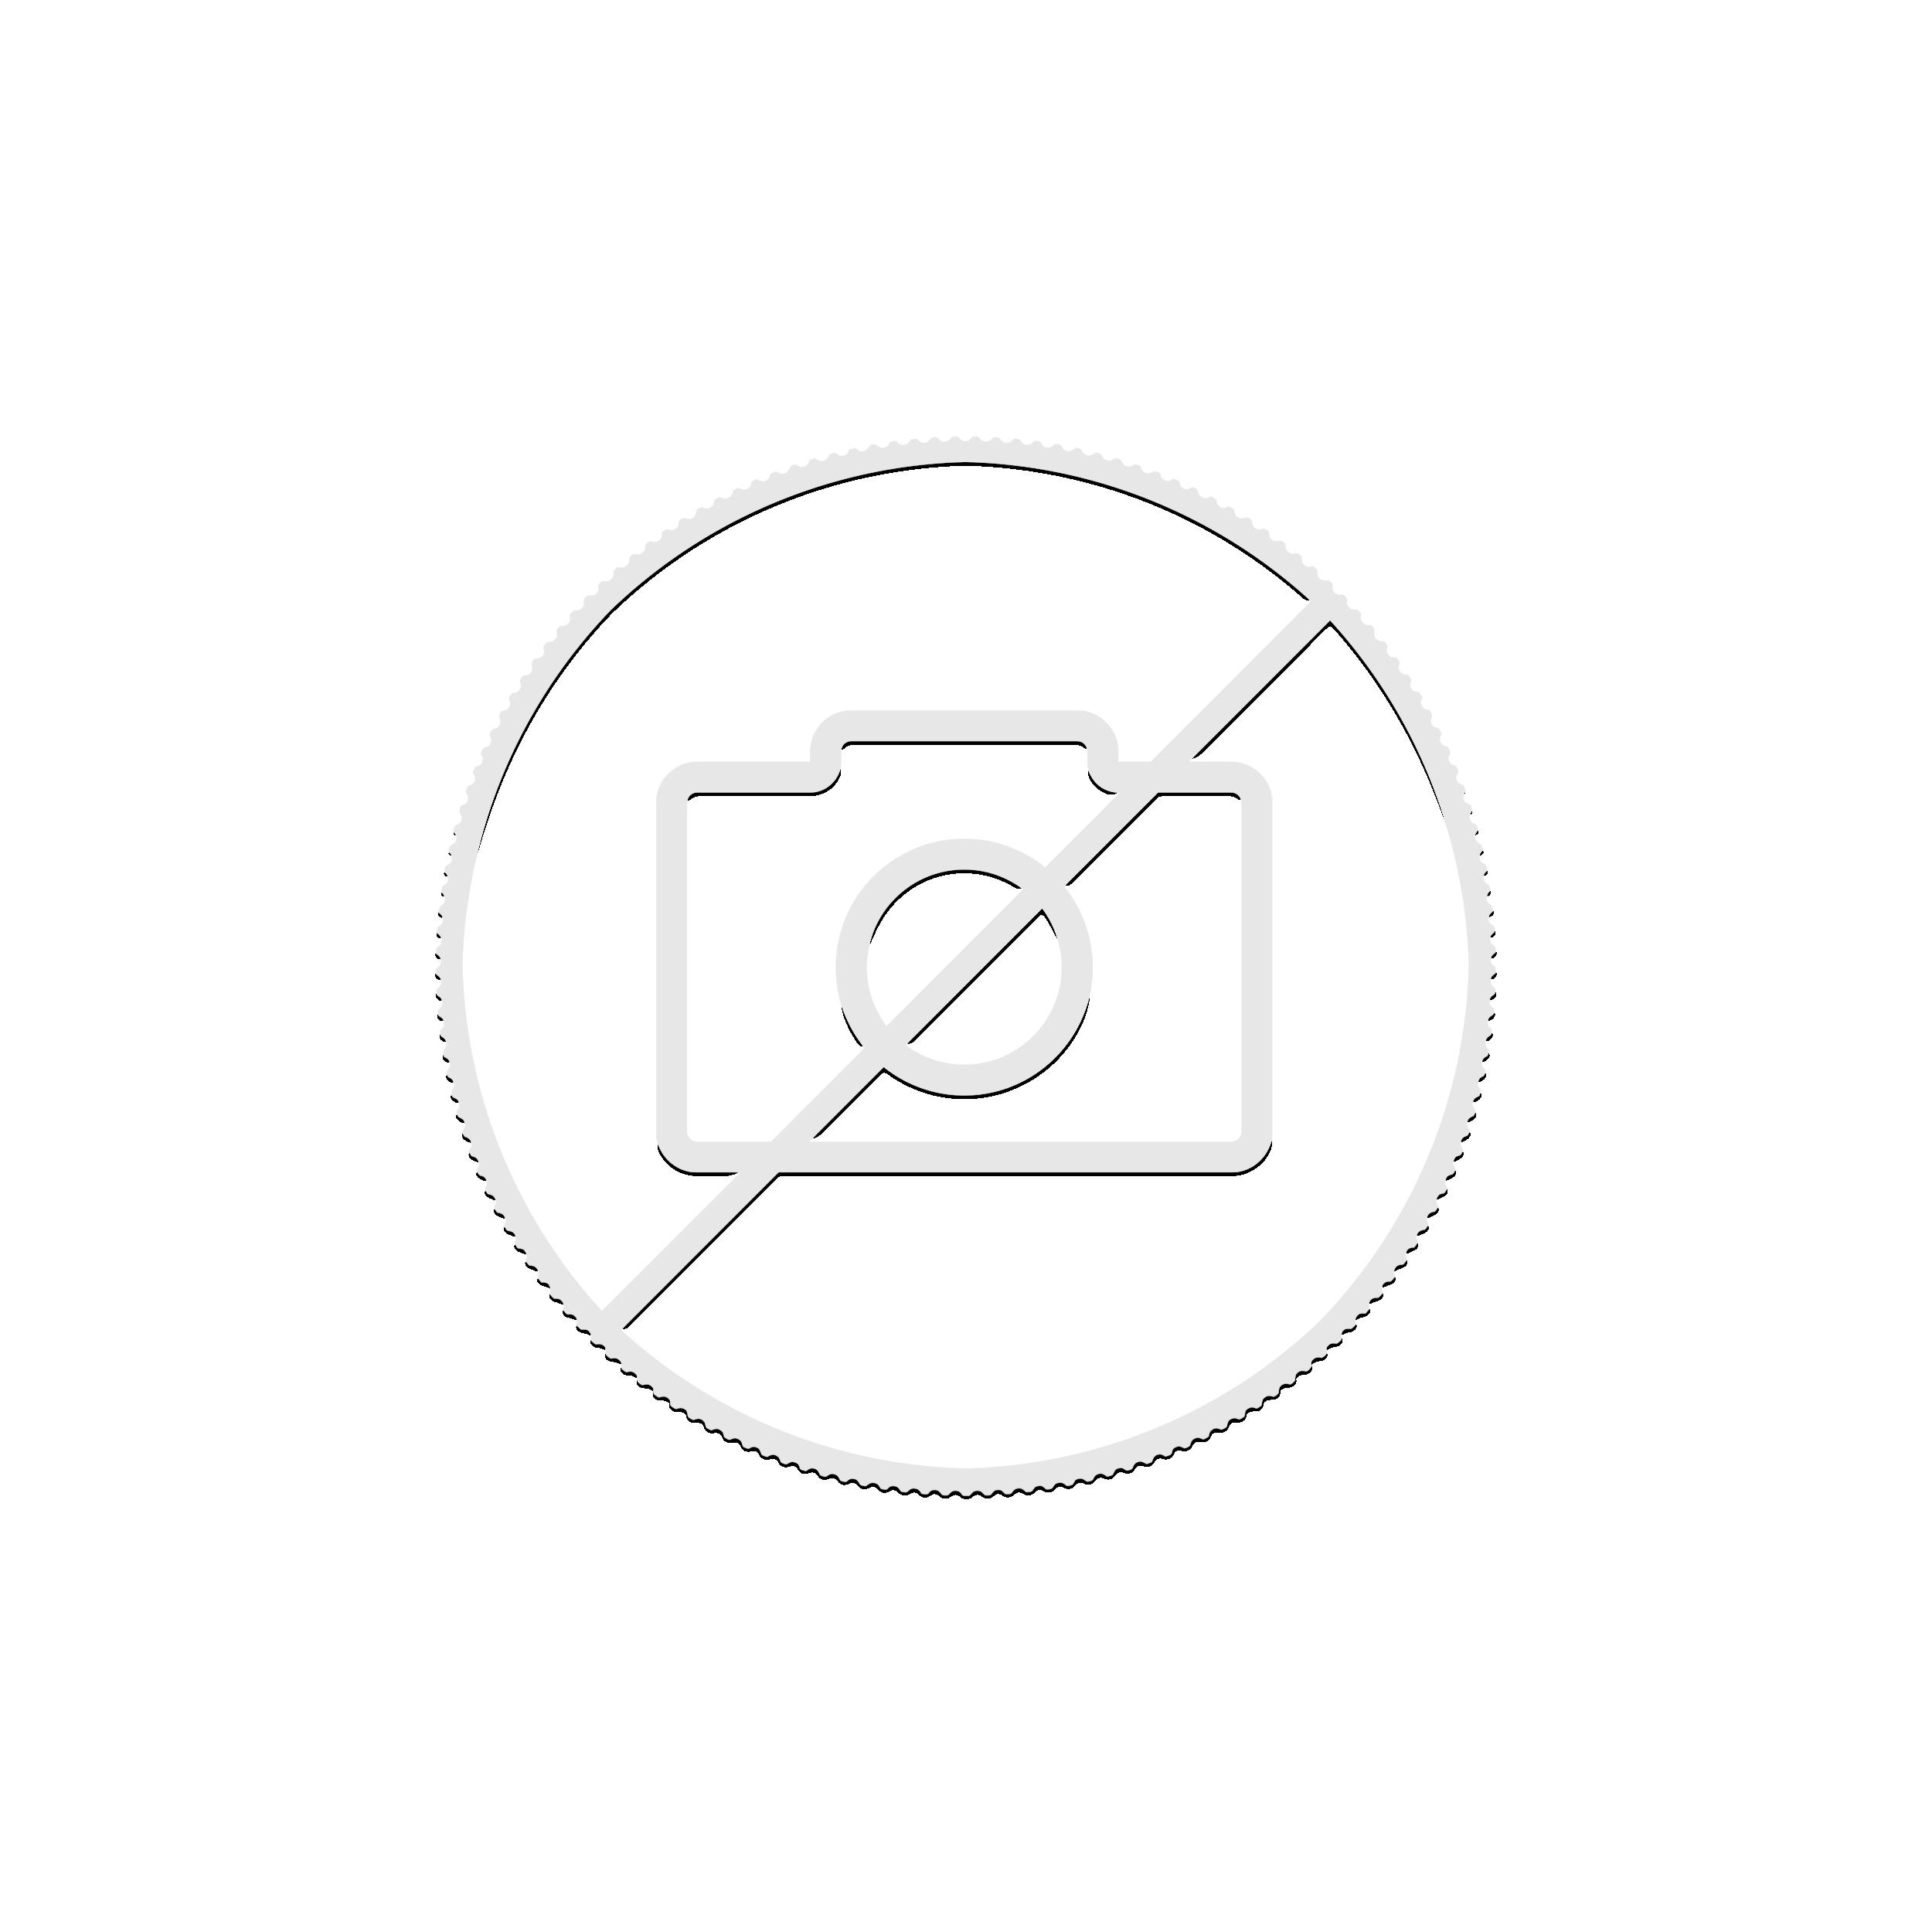 3 Gram gold coin Panda 2021